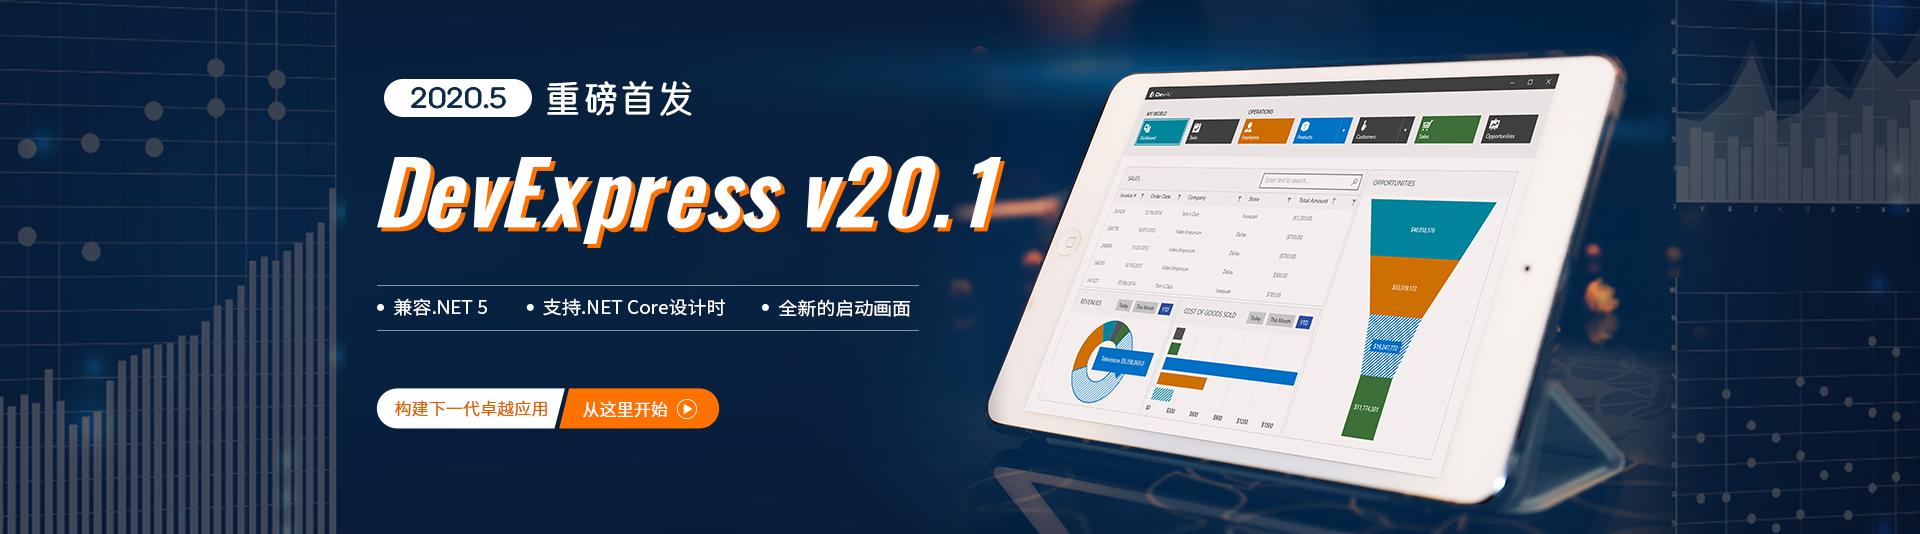 DevExpress v20.1全新发布